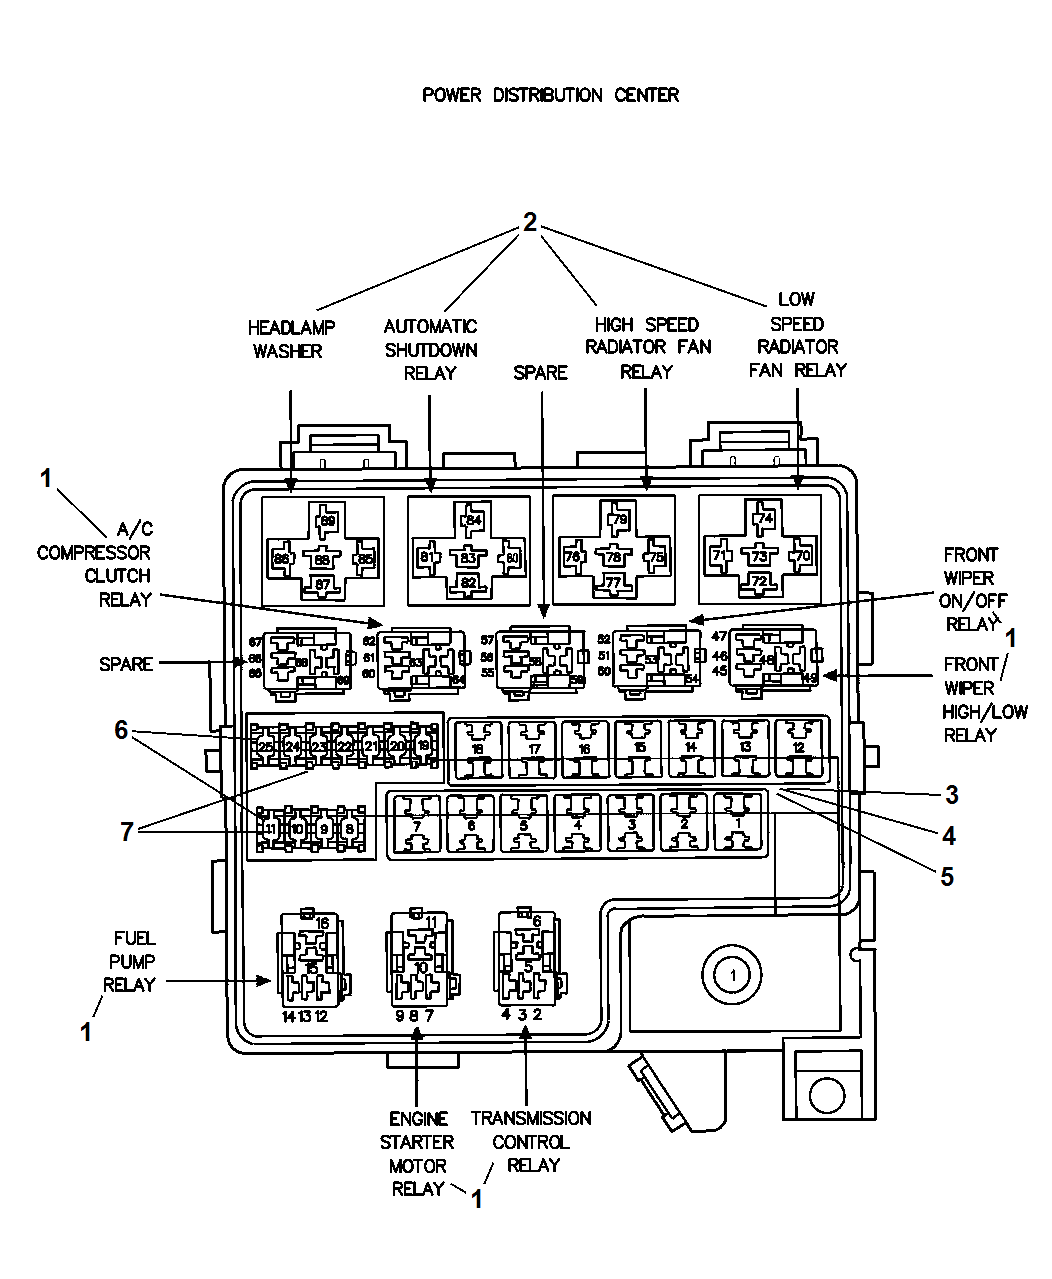 ES_8004] 2002 Dodge Stratus Rear Suspension Diagram Schematic Wiring | 2002 Dodge Stratus Radiator Diagram Wiring Schematic |  | Hila Skat Peted Phae Mohammedshrine Librar Wiring 101